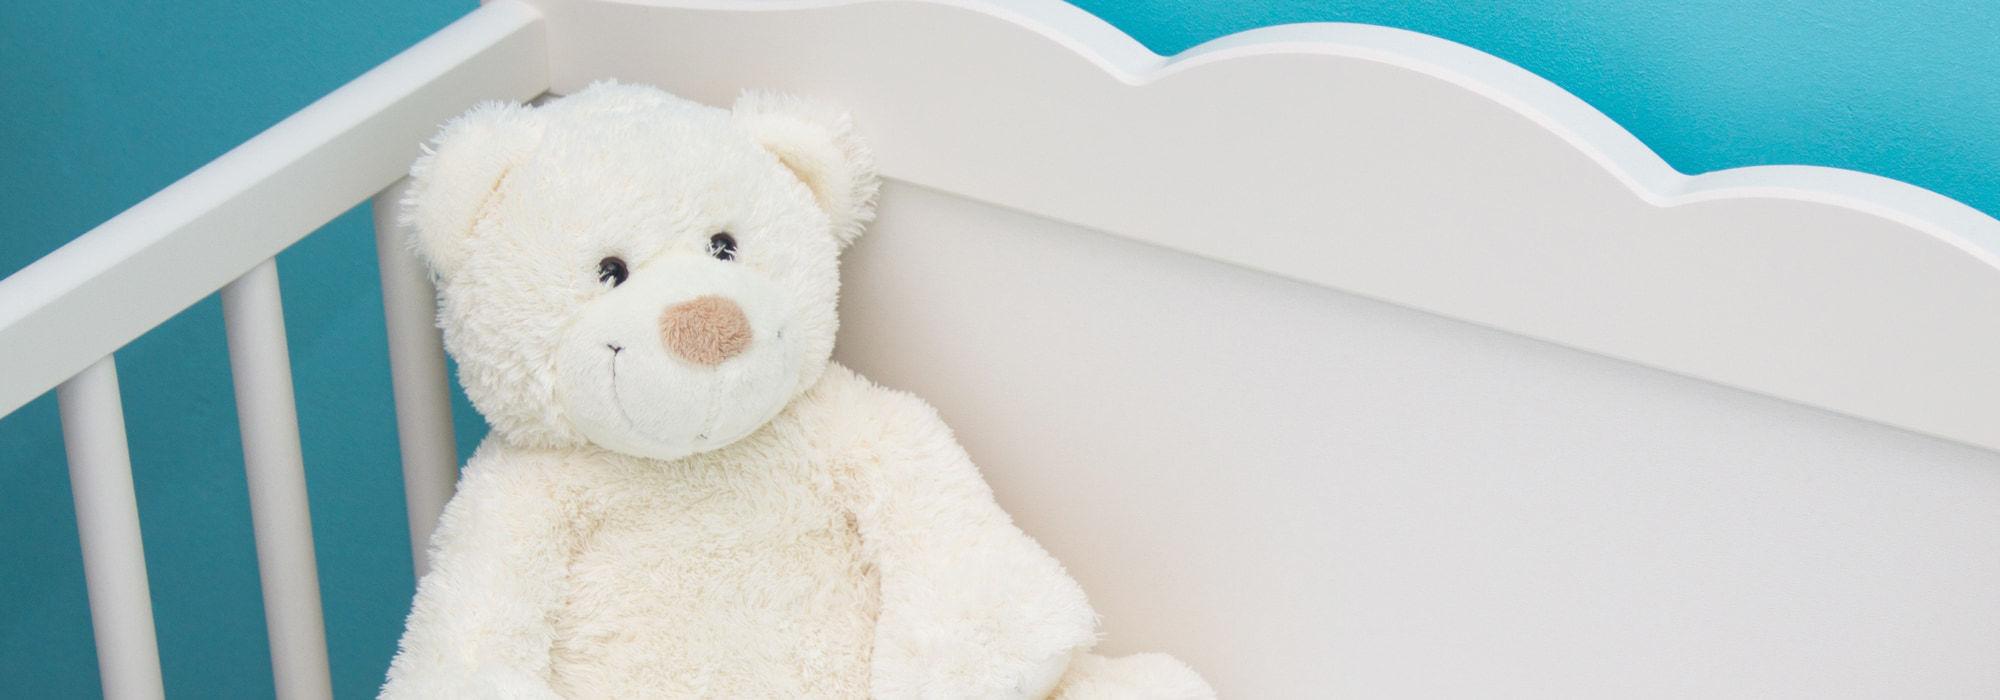 兒童及幼兒暑期興趣班推介2021|Kama Delivery小朋友到會外賣服務